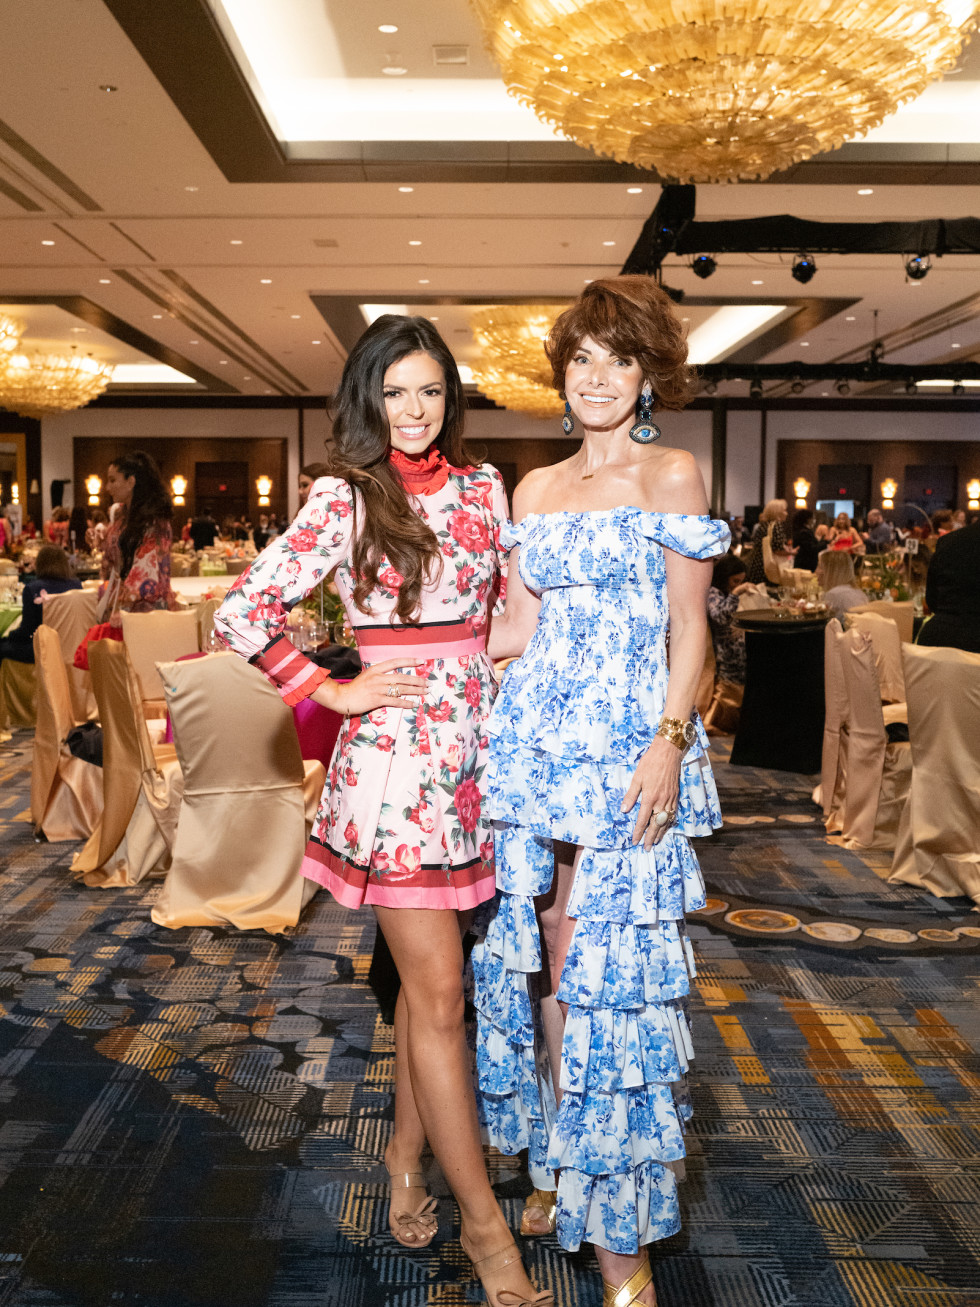 LWI 2021 Houston luncheon fashion show Miss Texas Logan Lester Tafelski, Marla Hurley